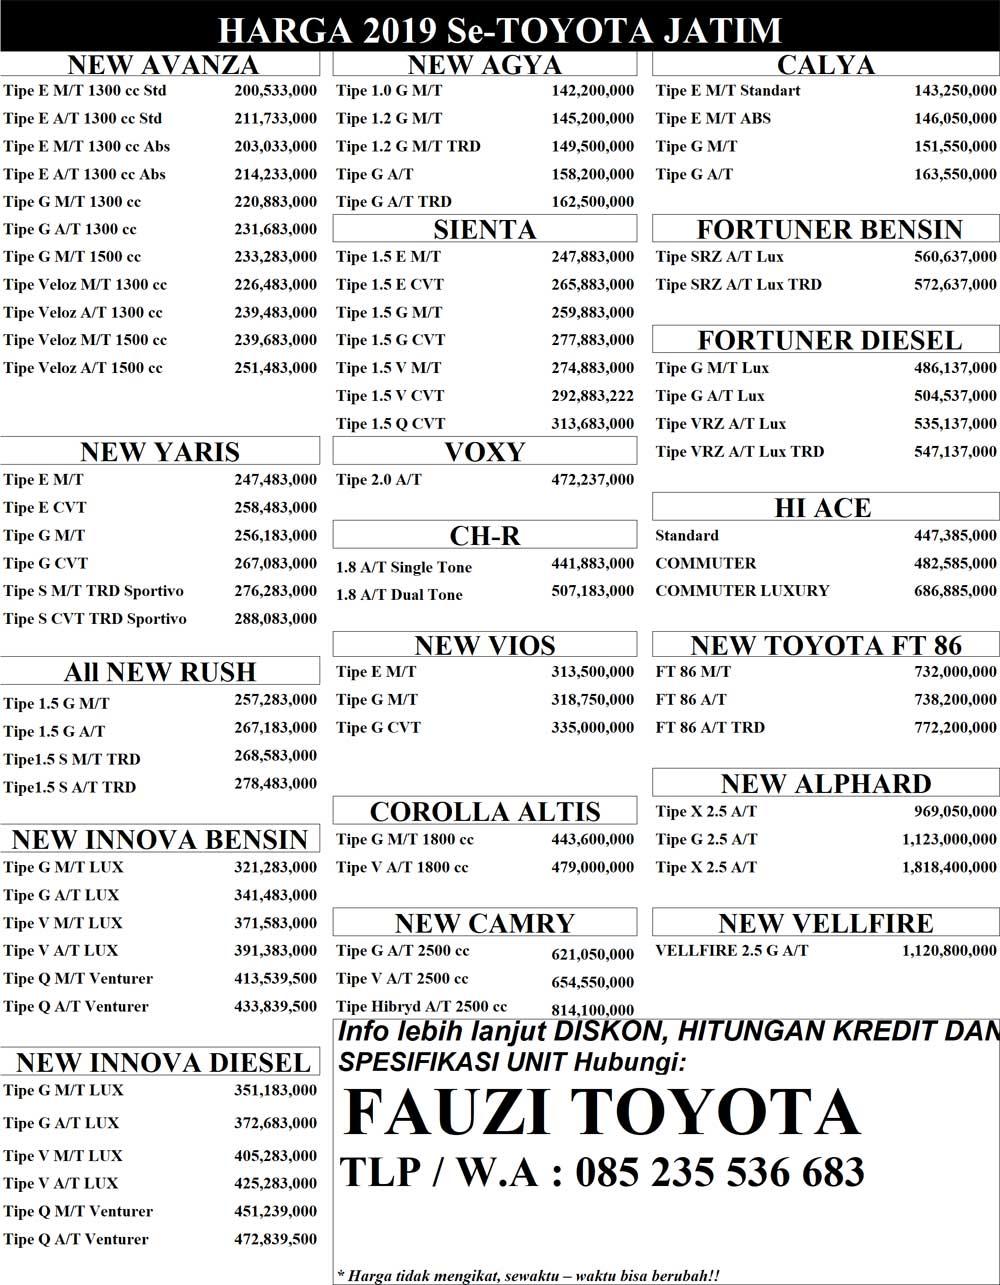 Harga Mobil Toyota By Fauzi